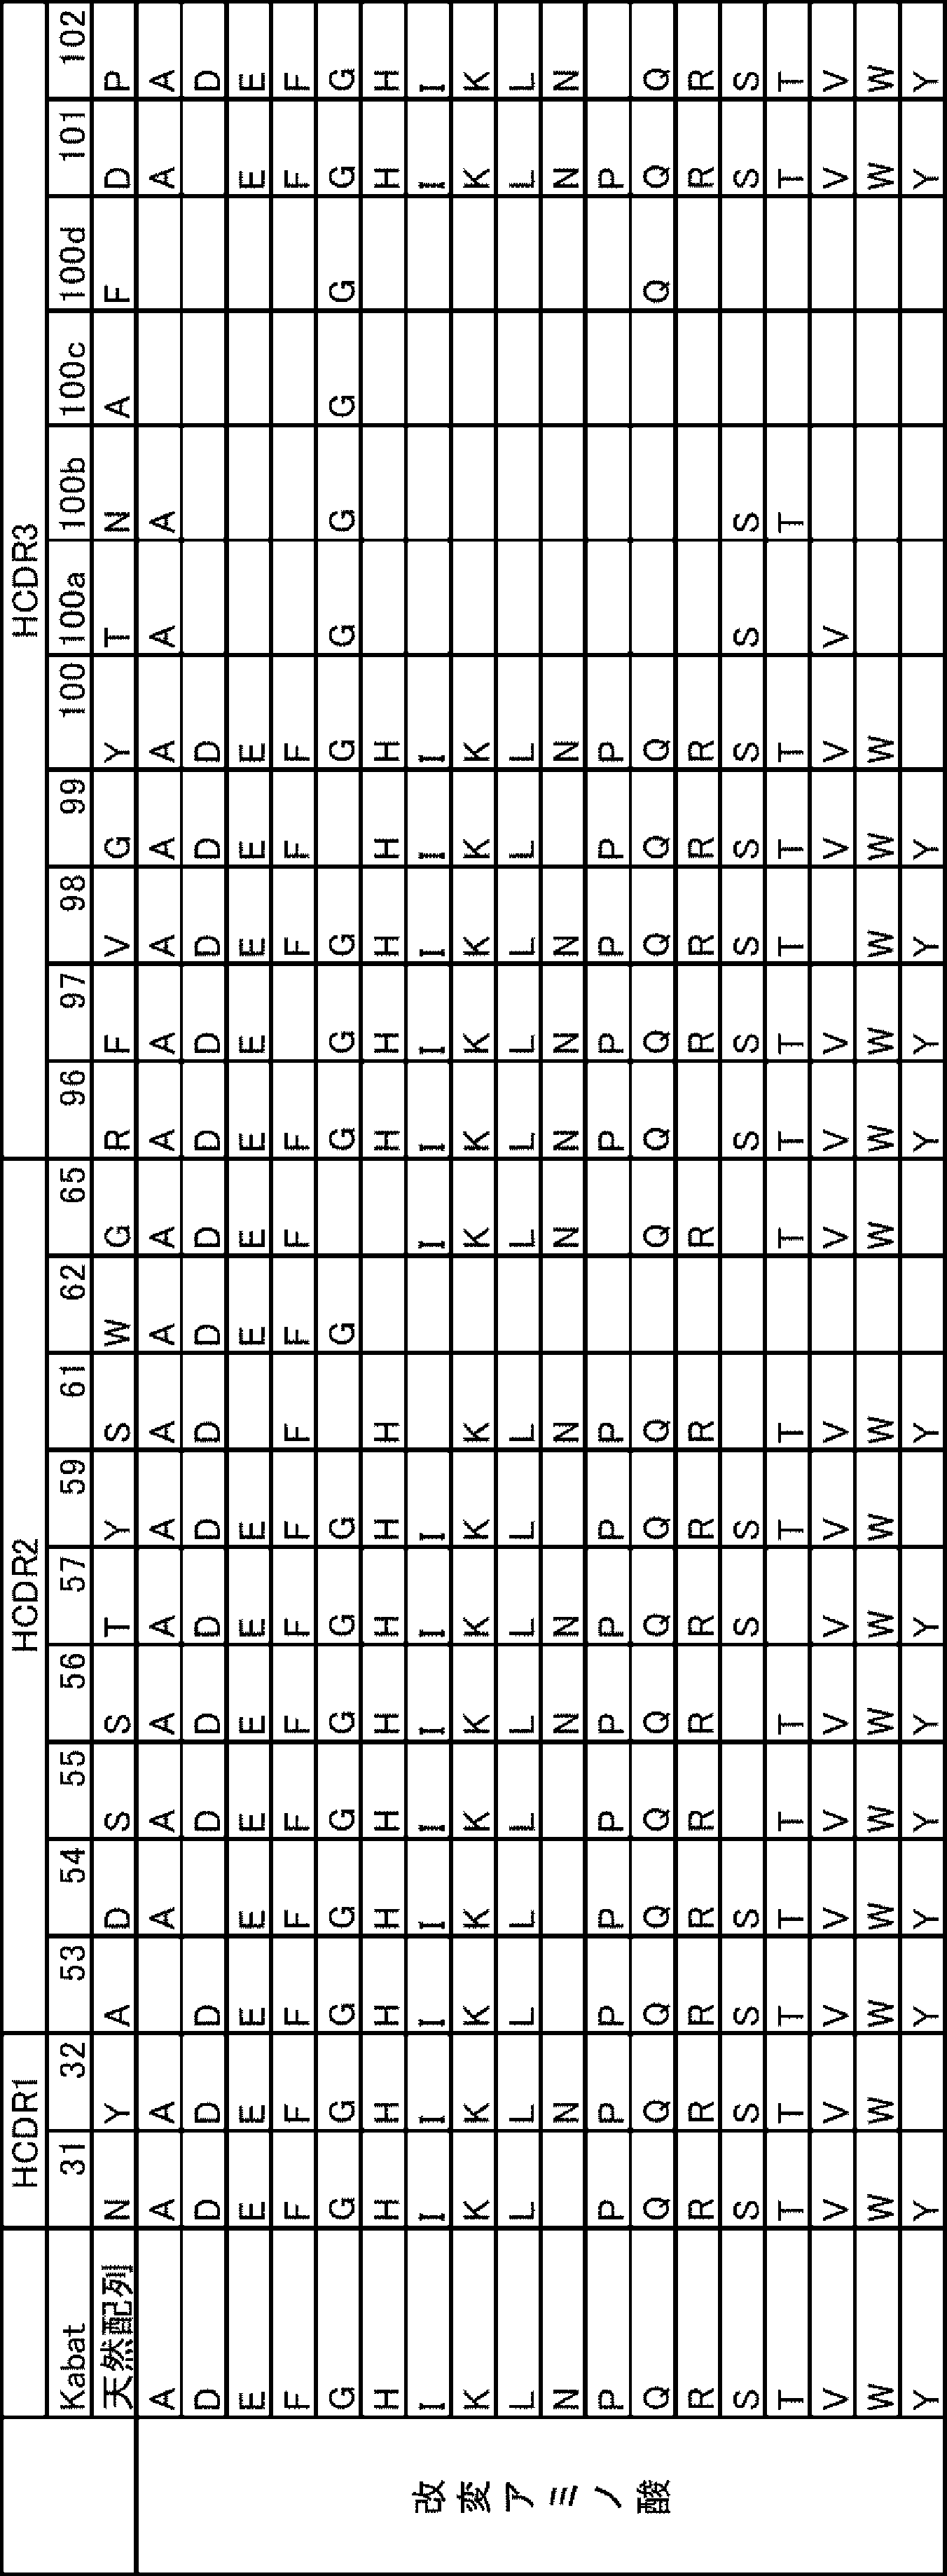 search q ec a7 84 ec a3 bc ec b6 9c ec 9e a5 ec 83 b5 ea b0 95 ec b6